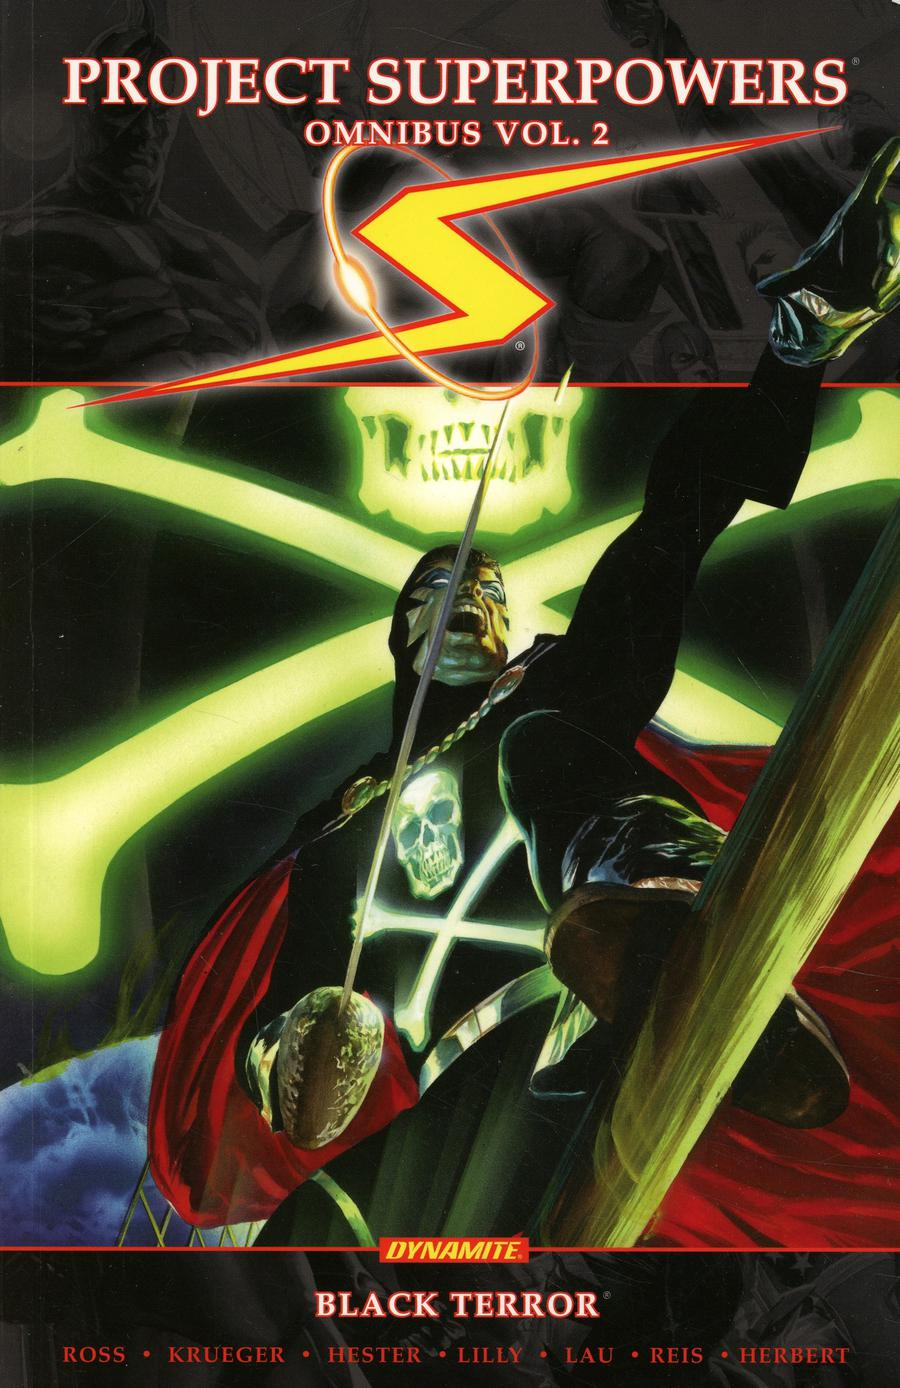 Project Superpowers Omnibus Vol 2 Black Terror TP